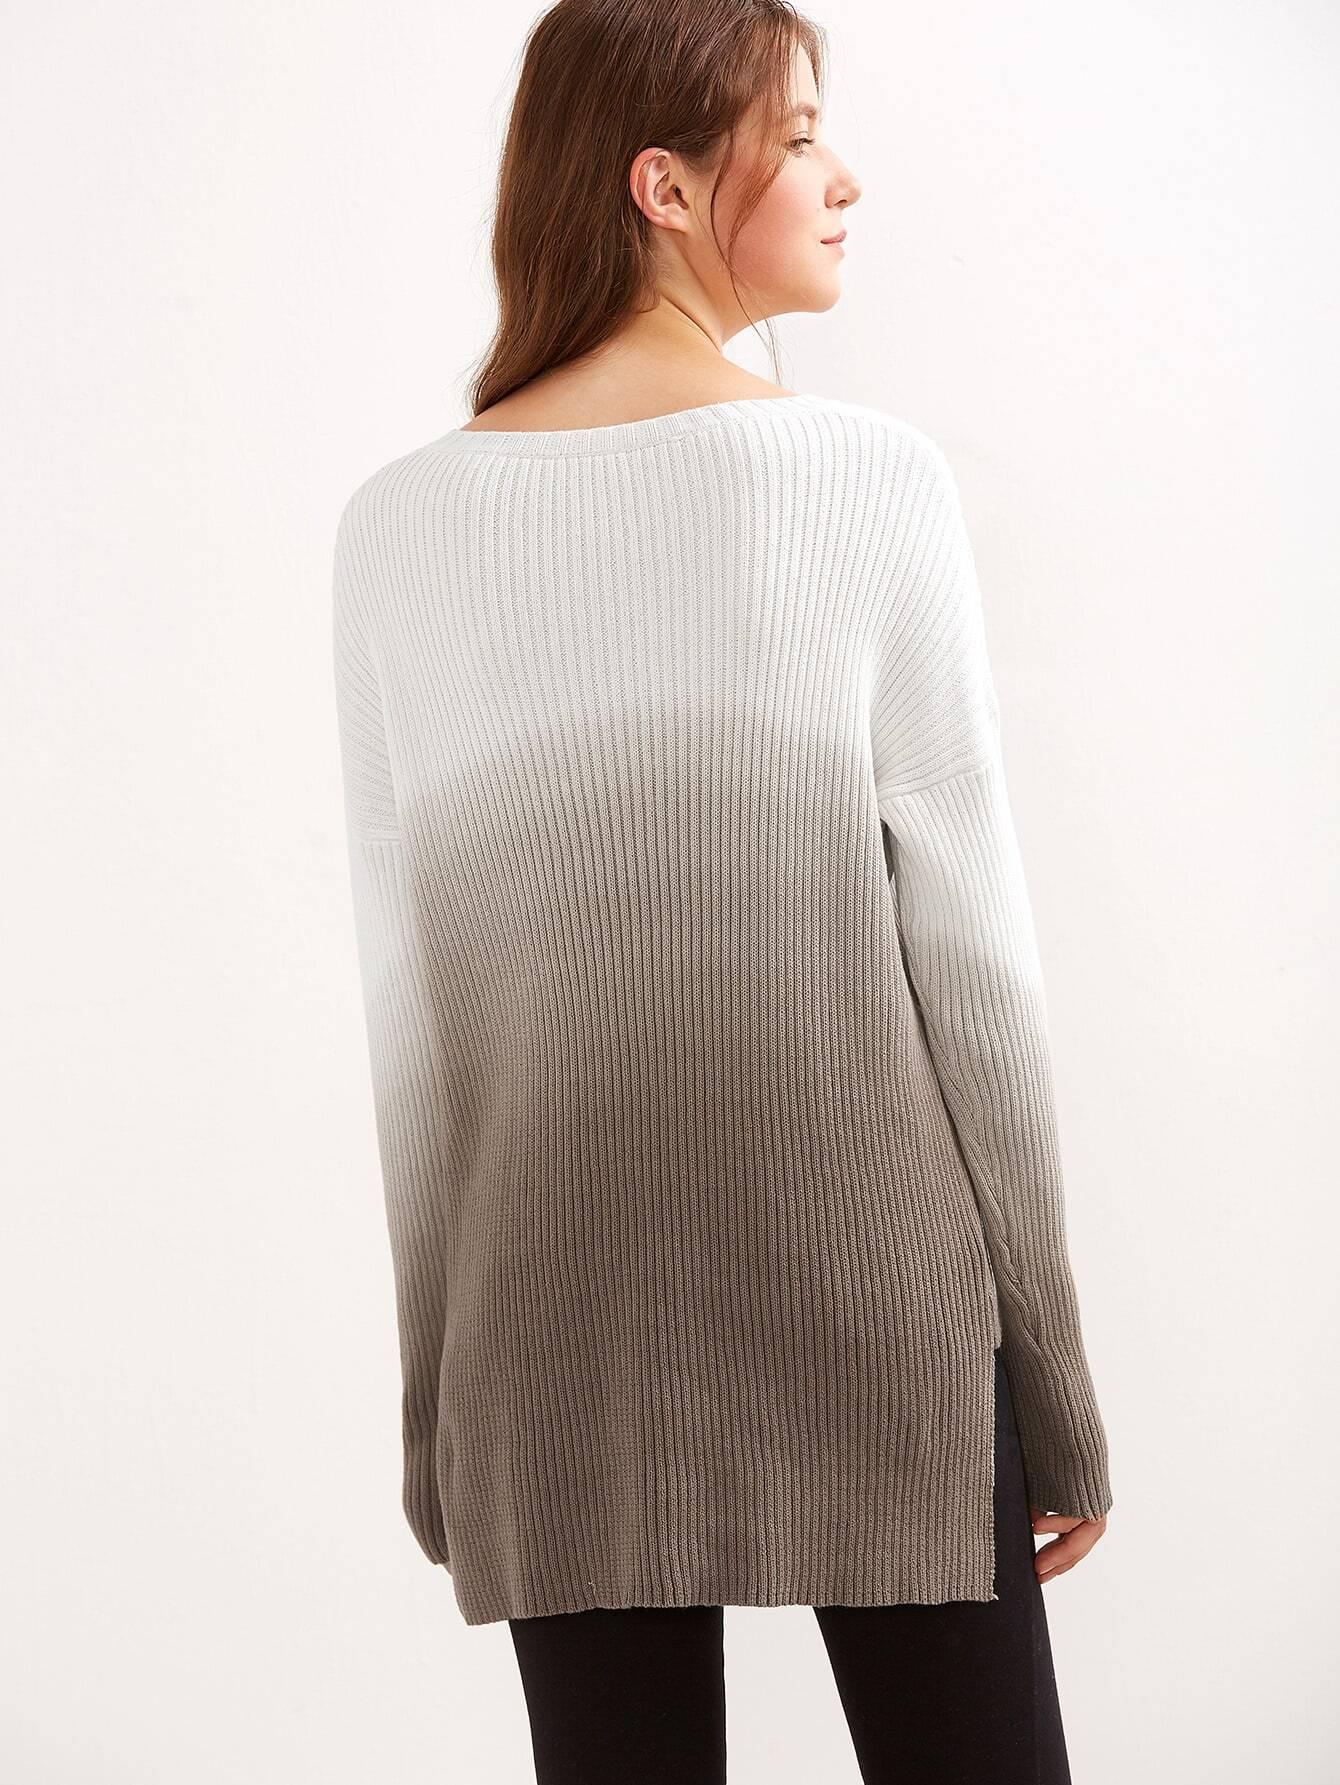 sweater160830456_2